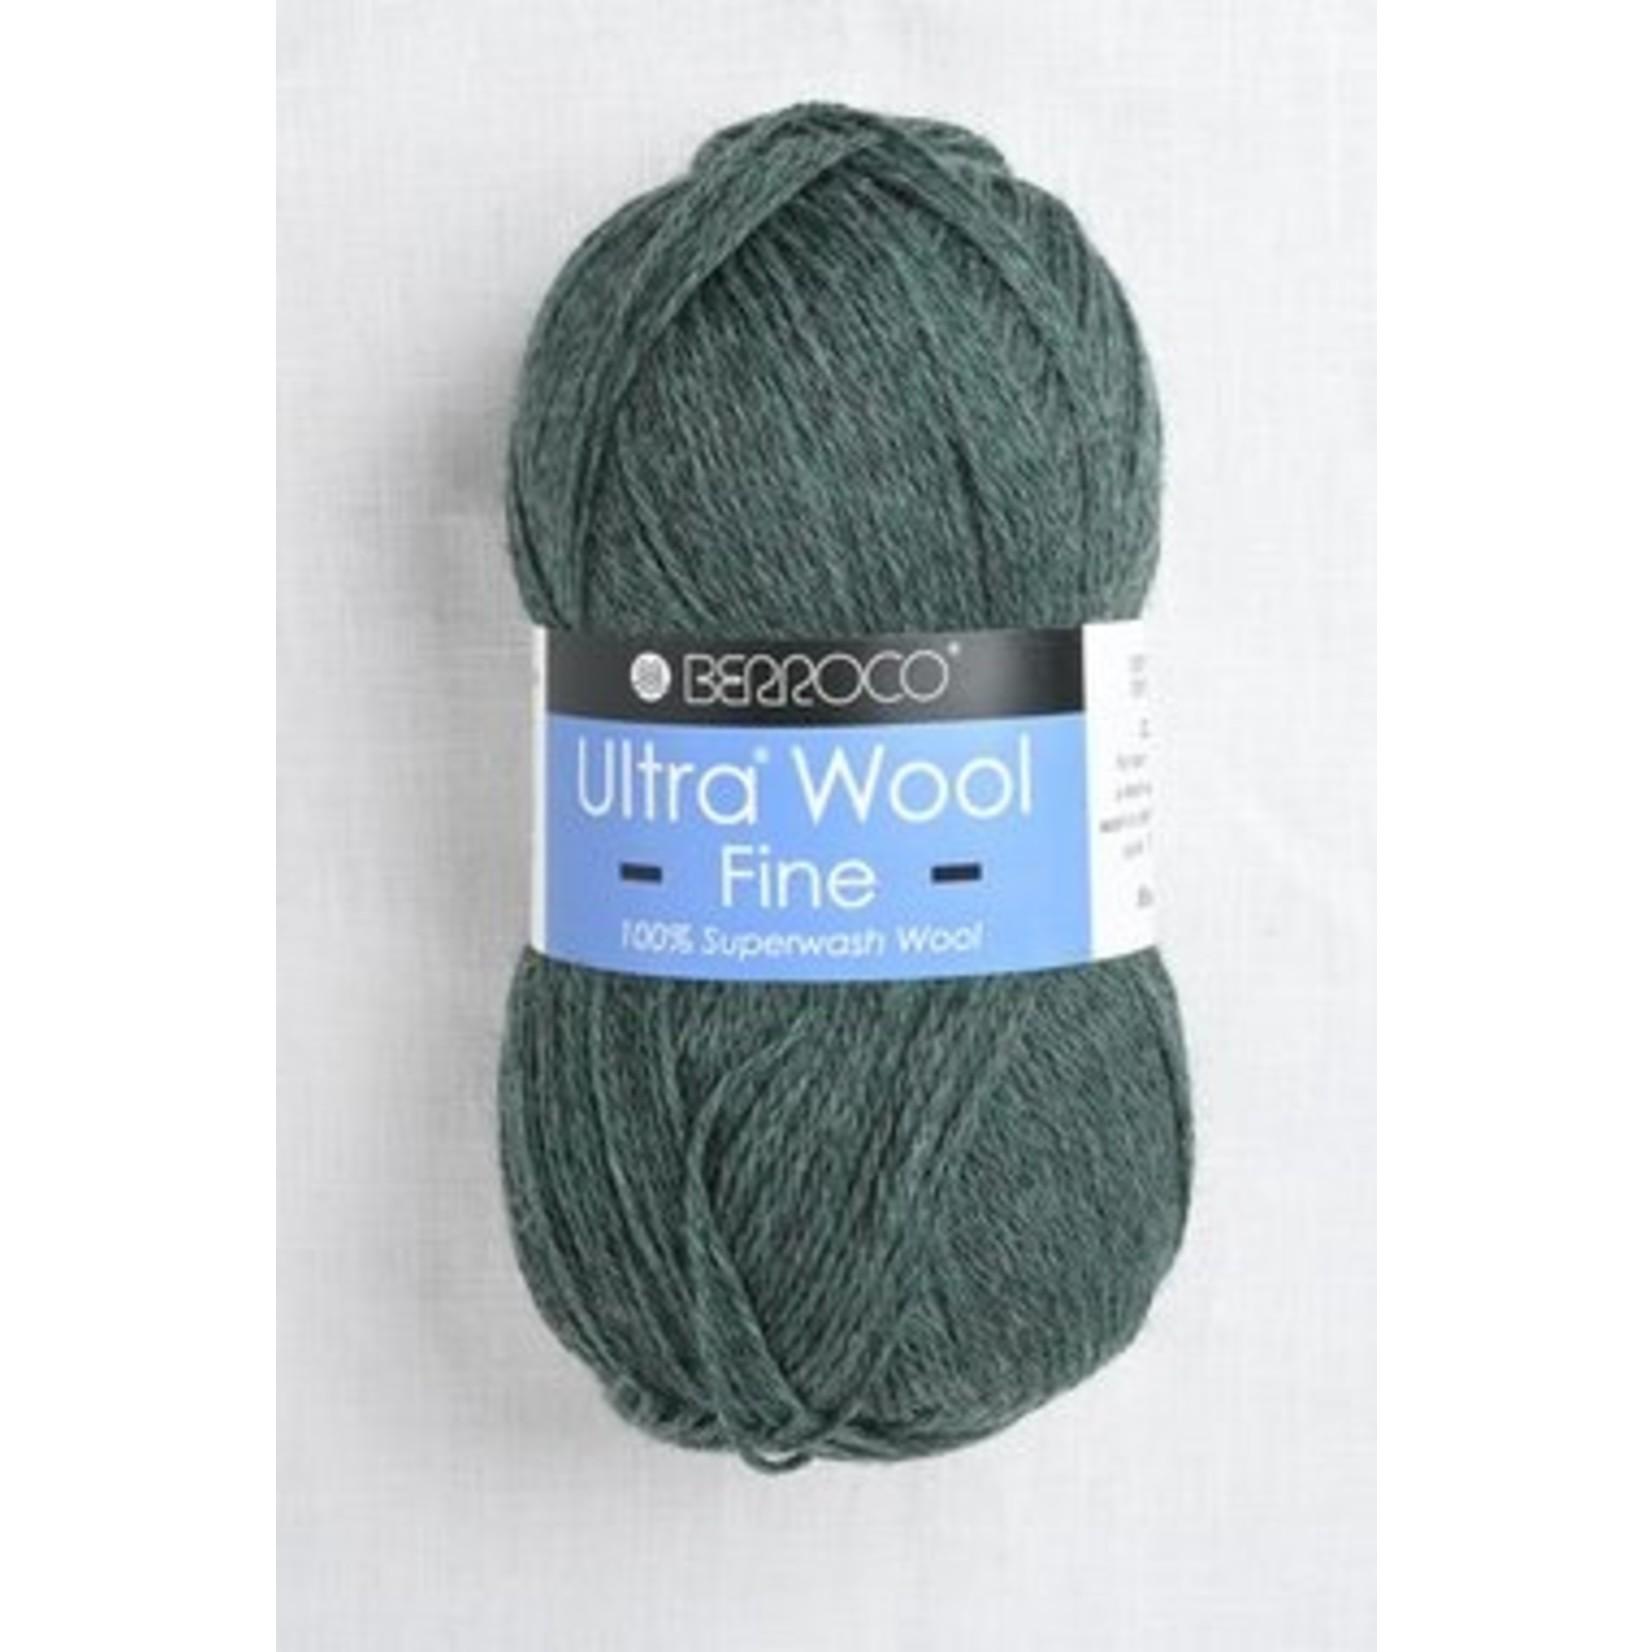 Berroco Berroco Ultra Wool Fine, 53158, Rosemary